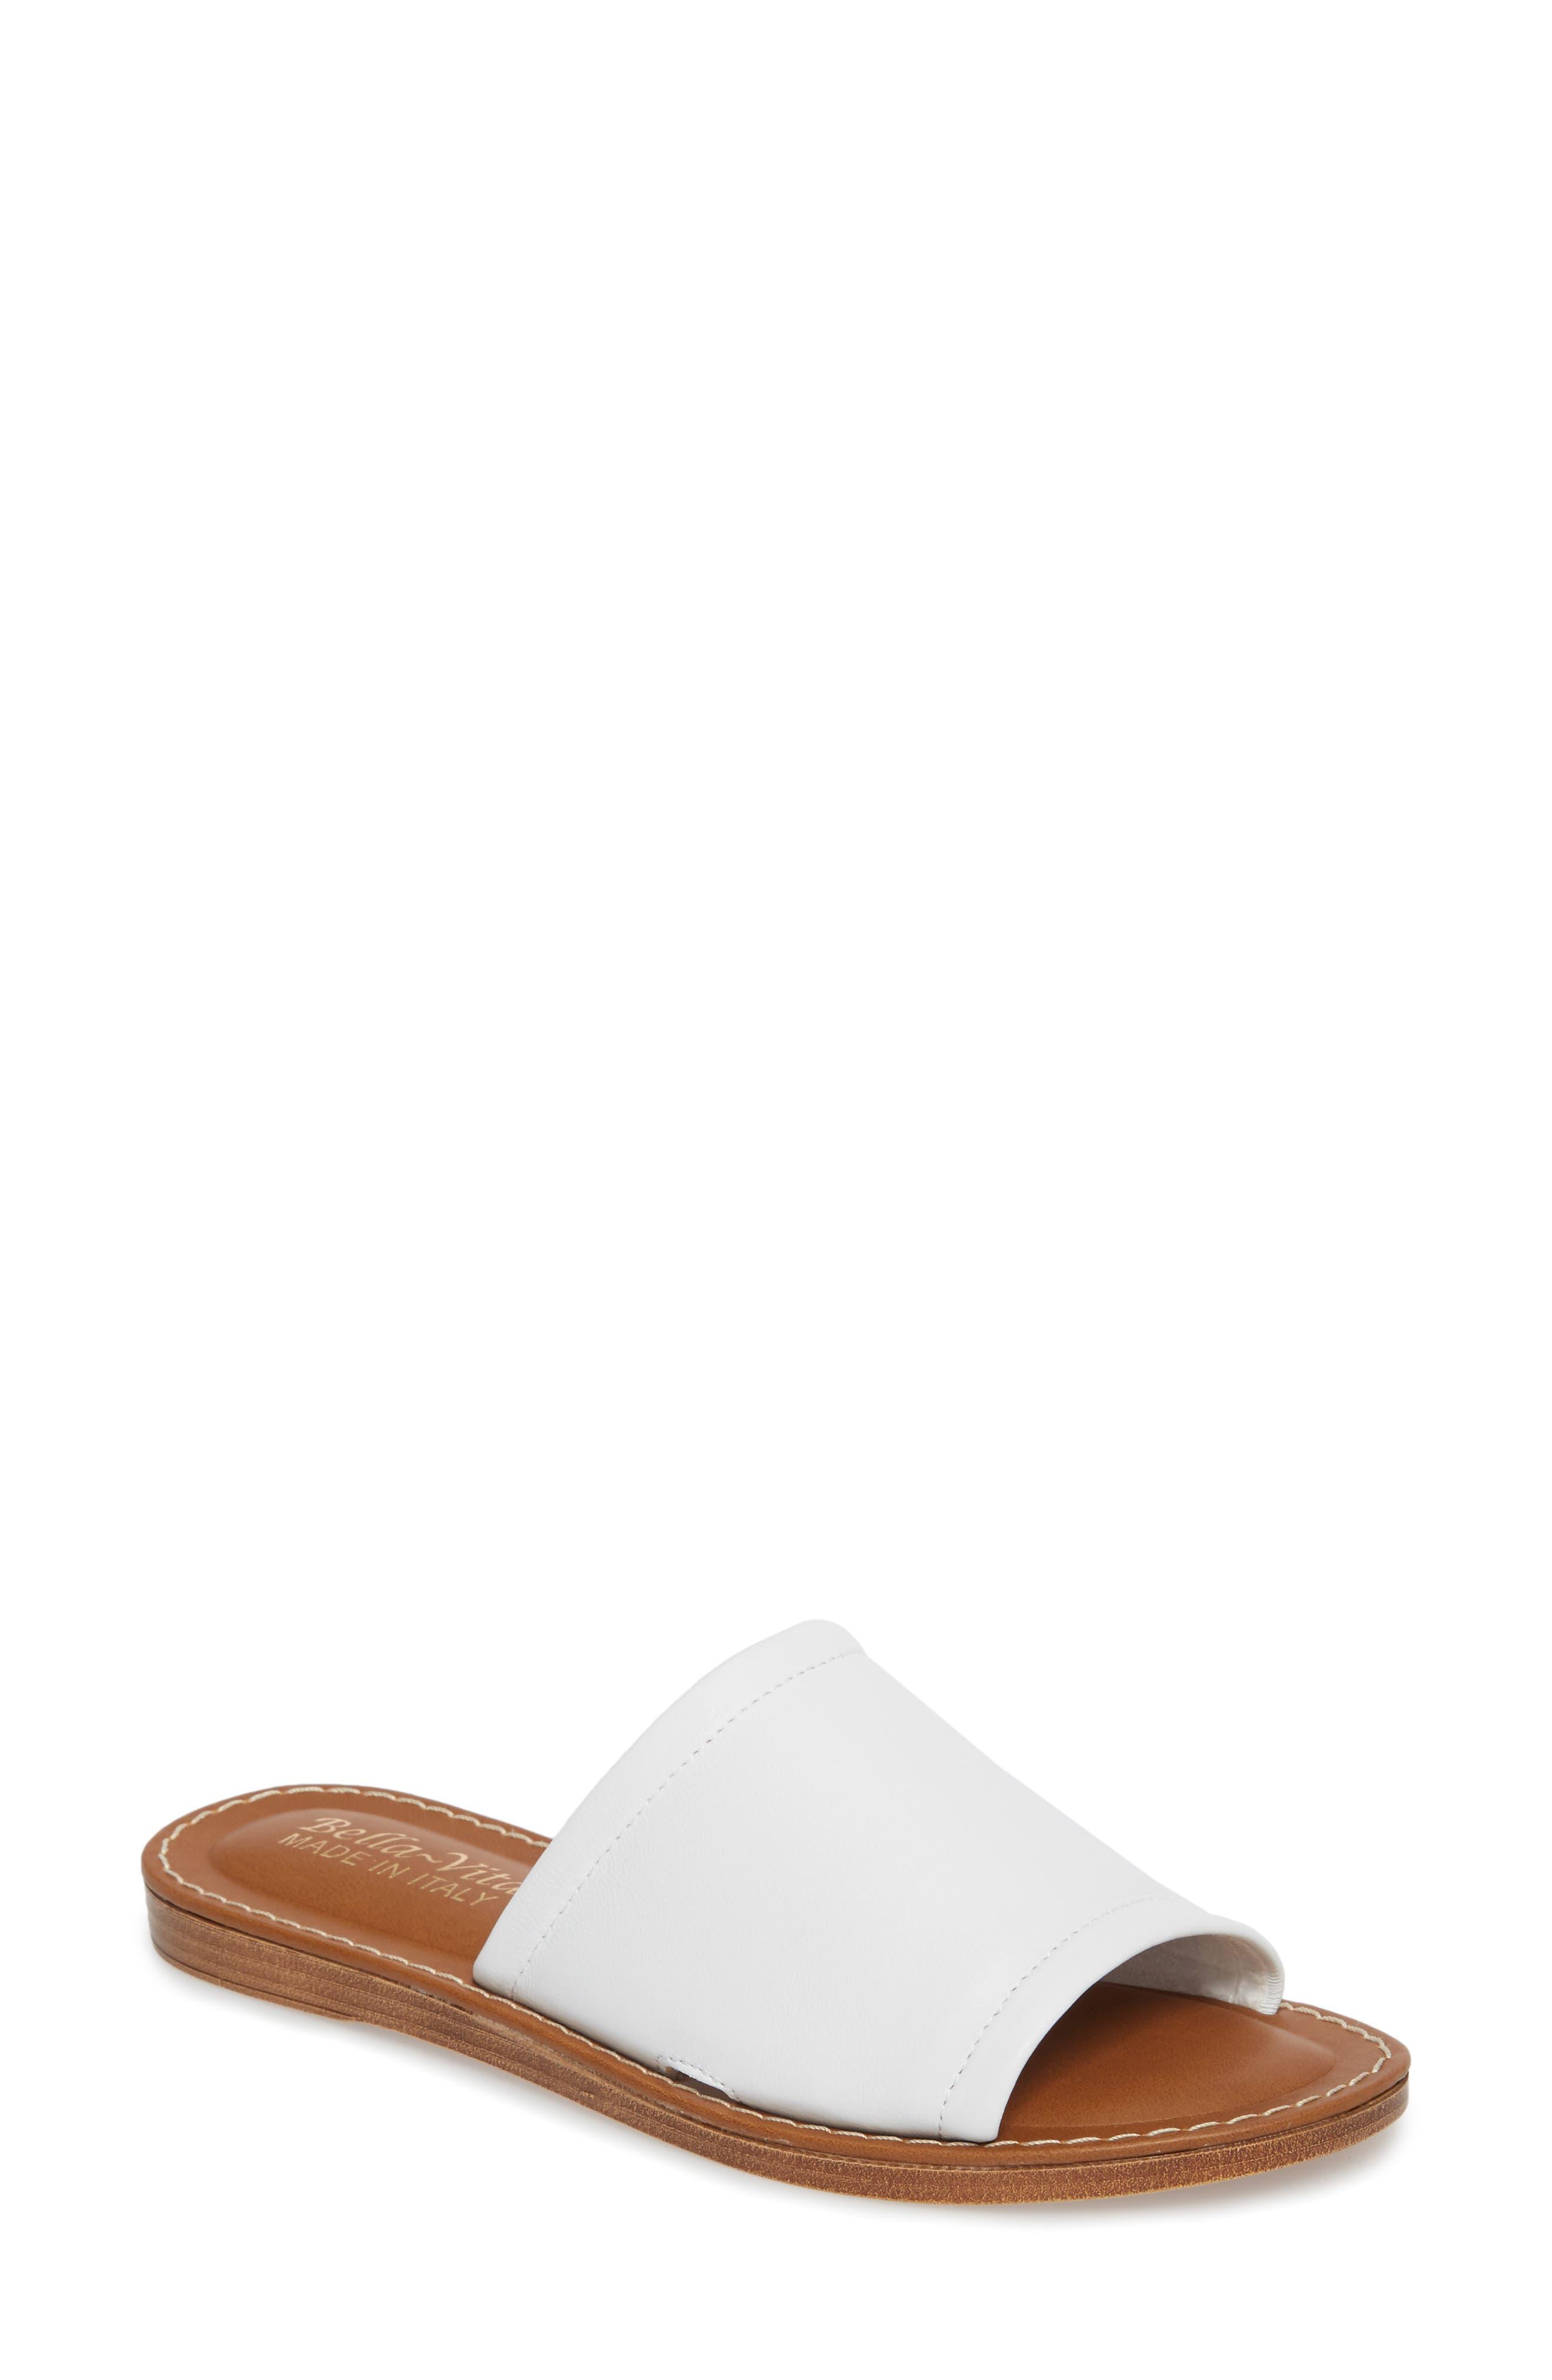 Ros Slide Sandal,                             Main thumbnail 1, color,                             White Leather